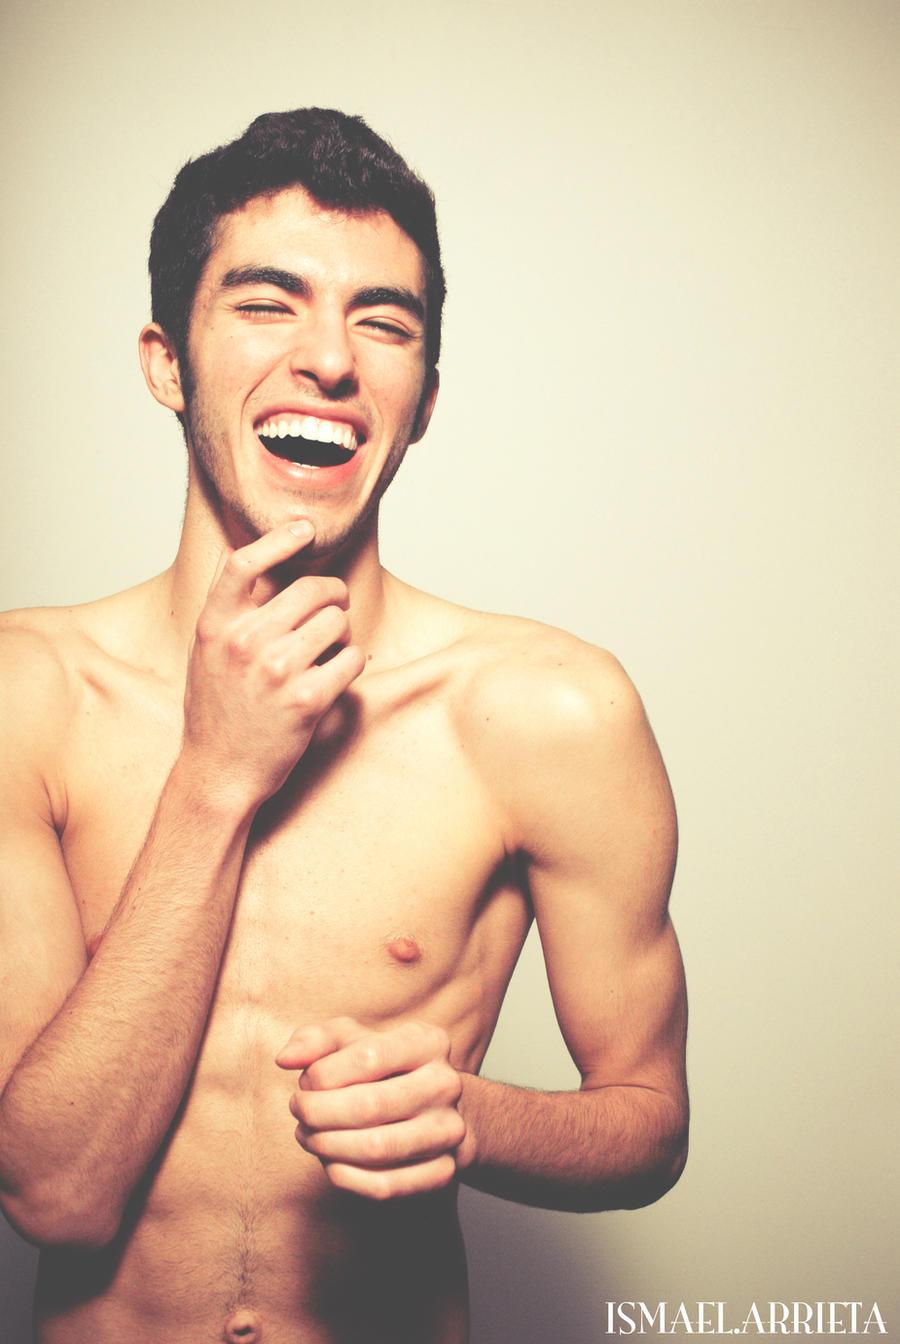 Laughz by ima-arrieta